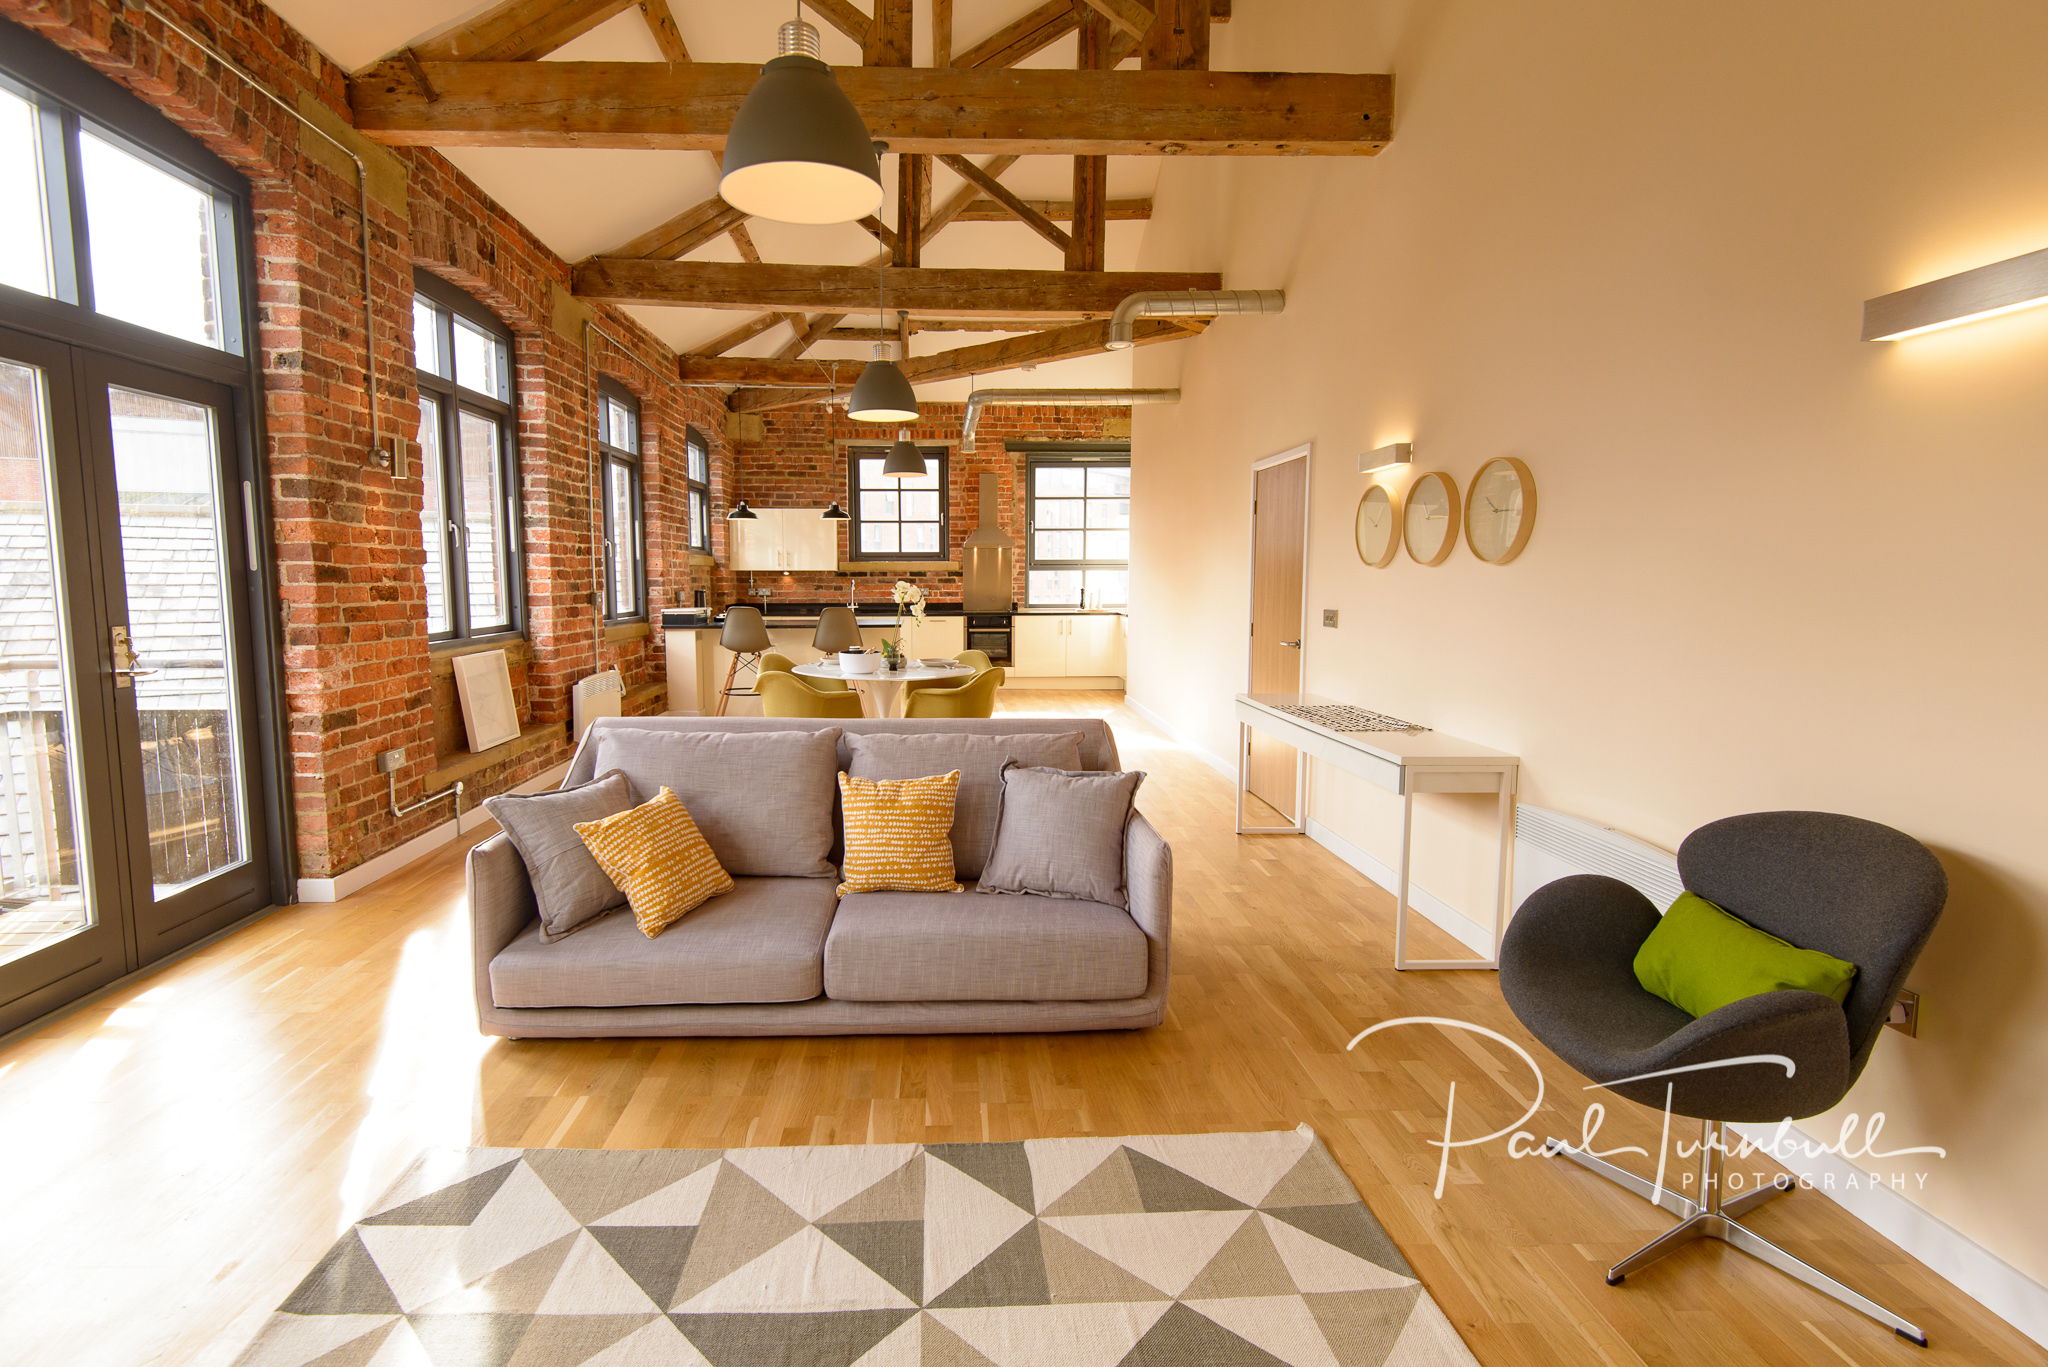 commercial-property-photographer-leeds-yorkshire-blackbrook-developments-018.jpg